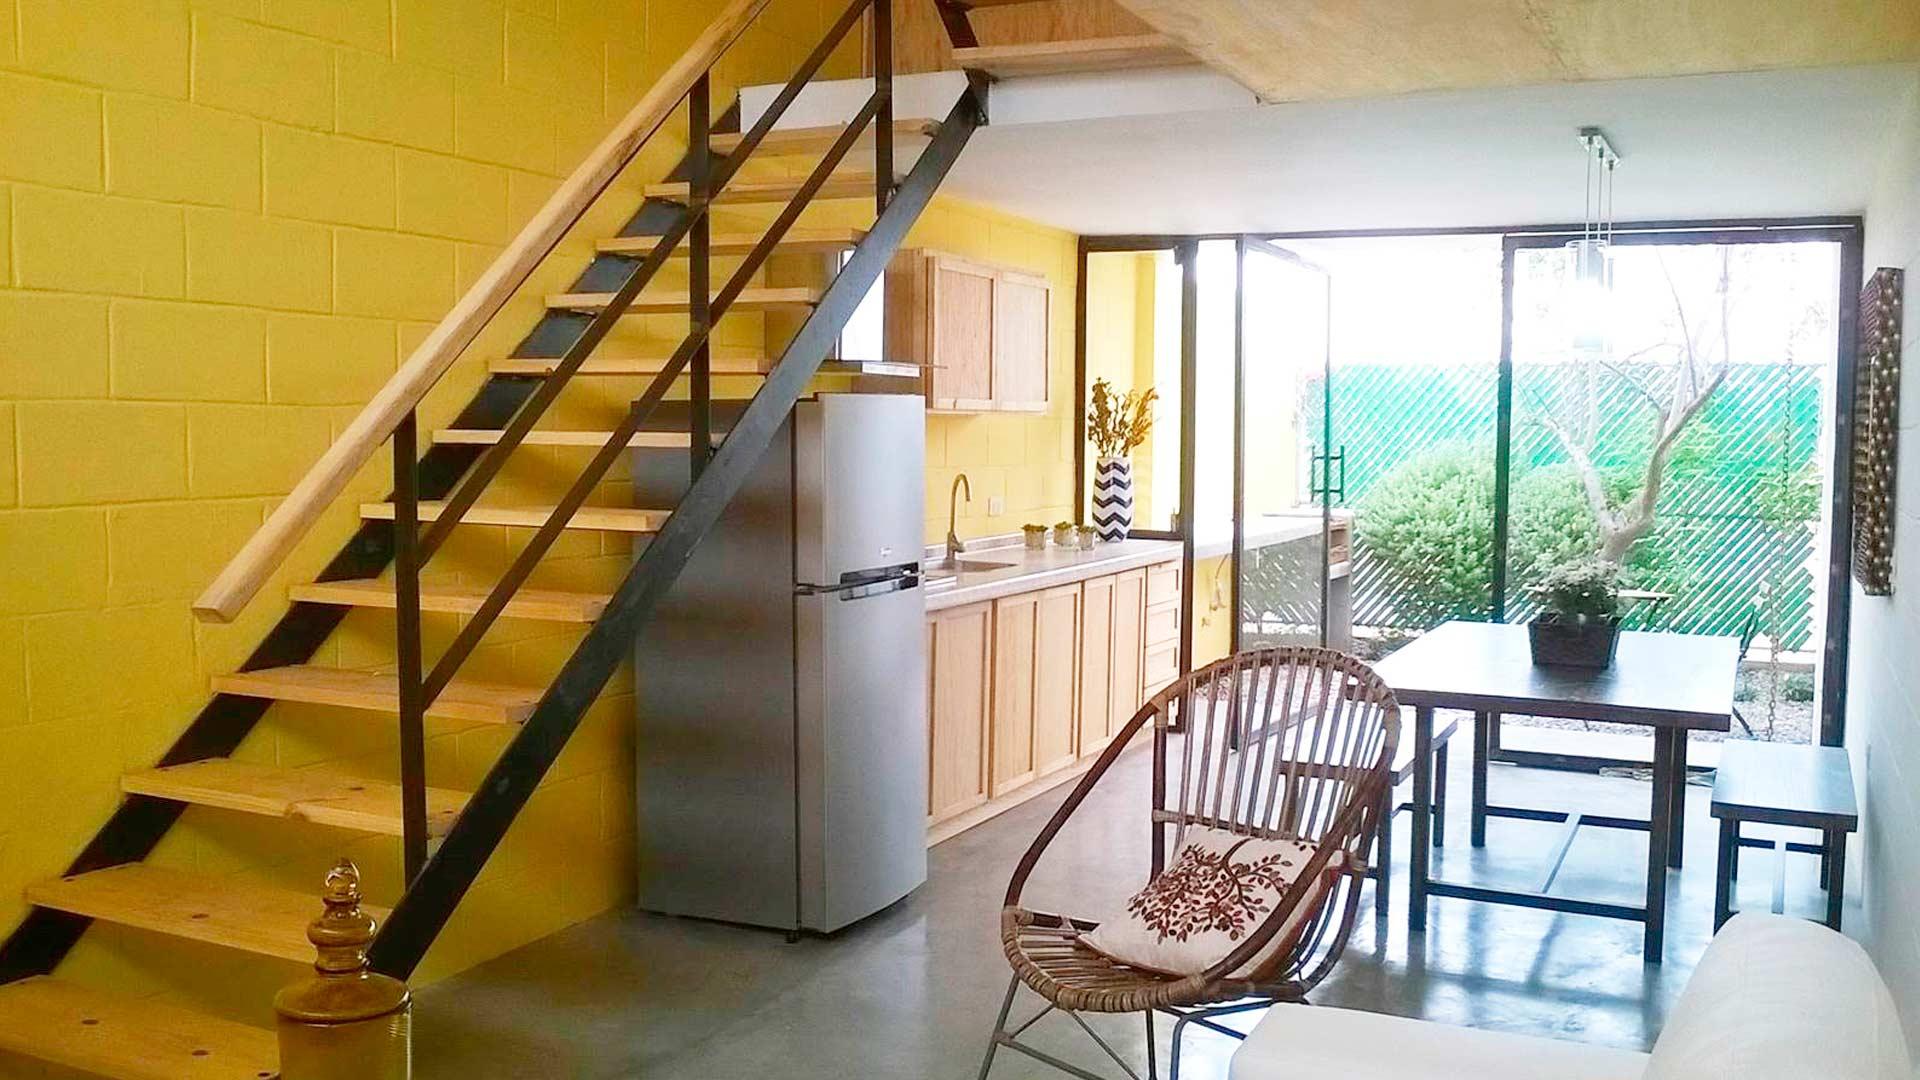 Bosco-Residencial-ventanal-2.jpg